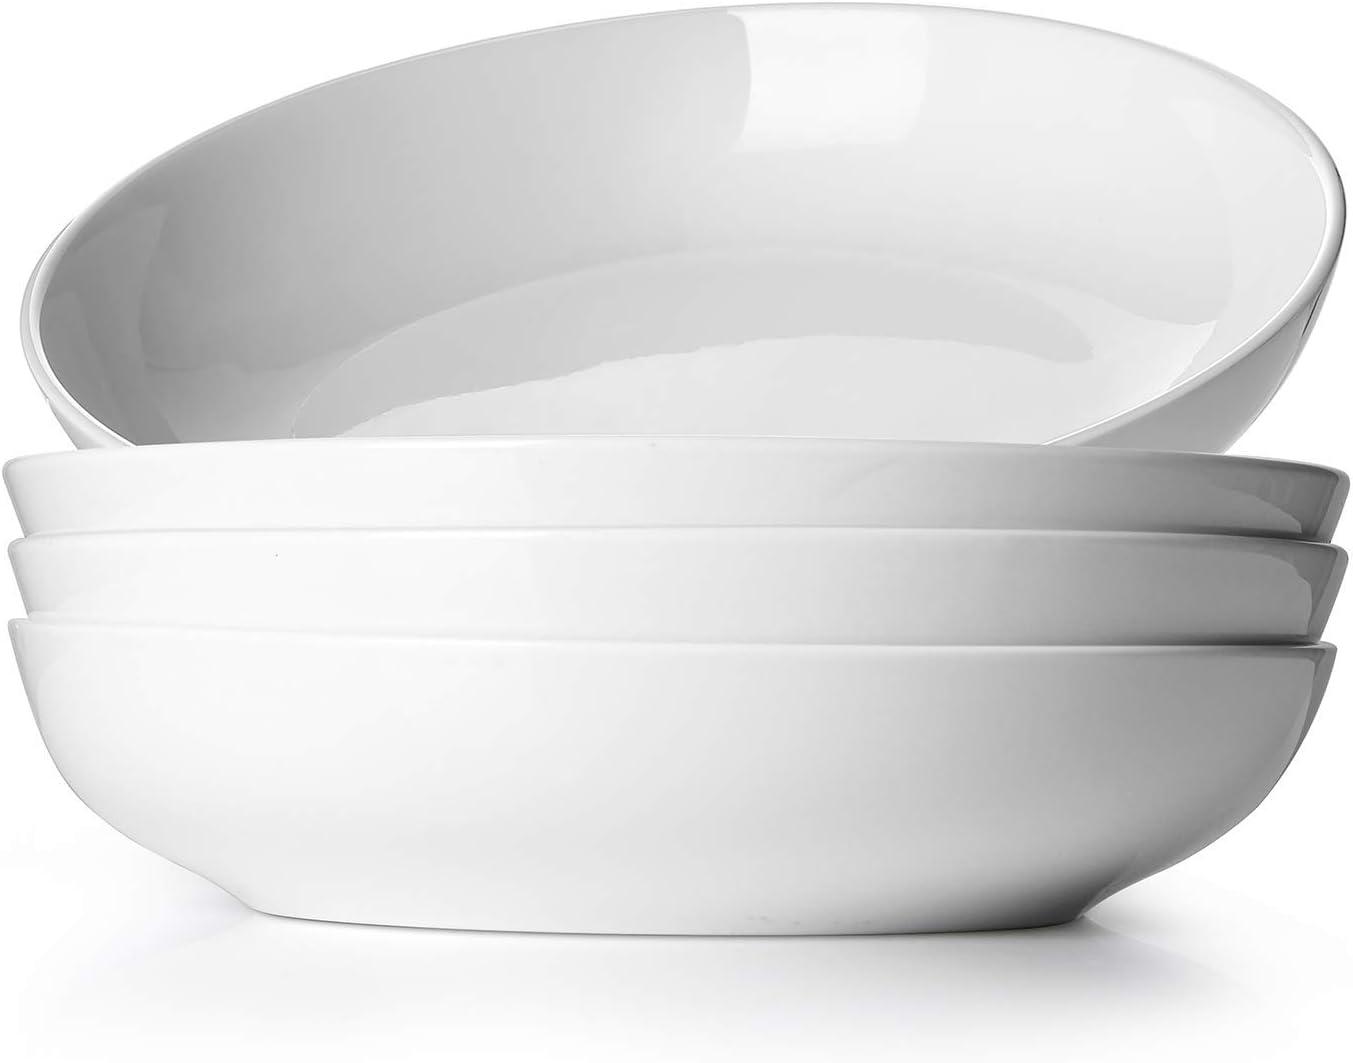 DOWAN Ceramic Pasta Salad Bowls, 50 Ounces Large Serving Bowl Set of 4, Microwave and Dishwasher Safe, Shallow & Versatile Enough, White